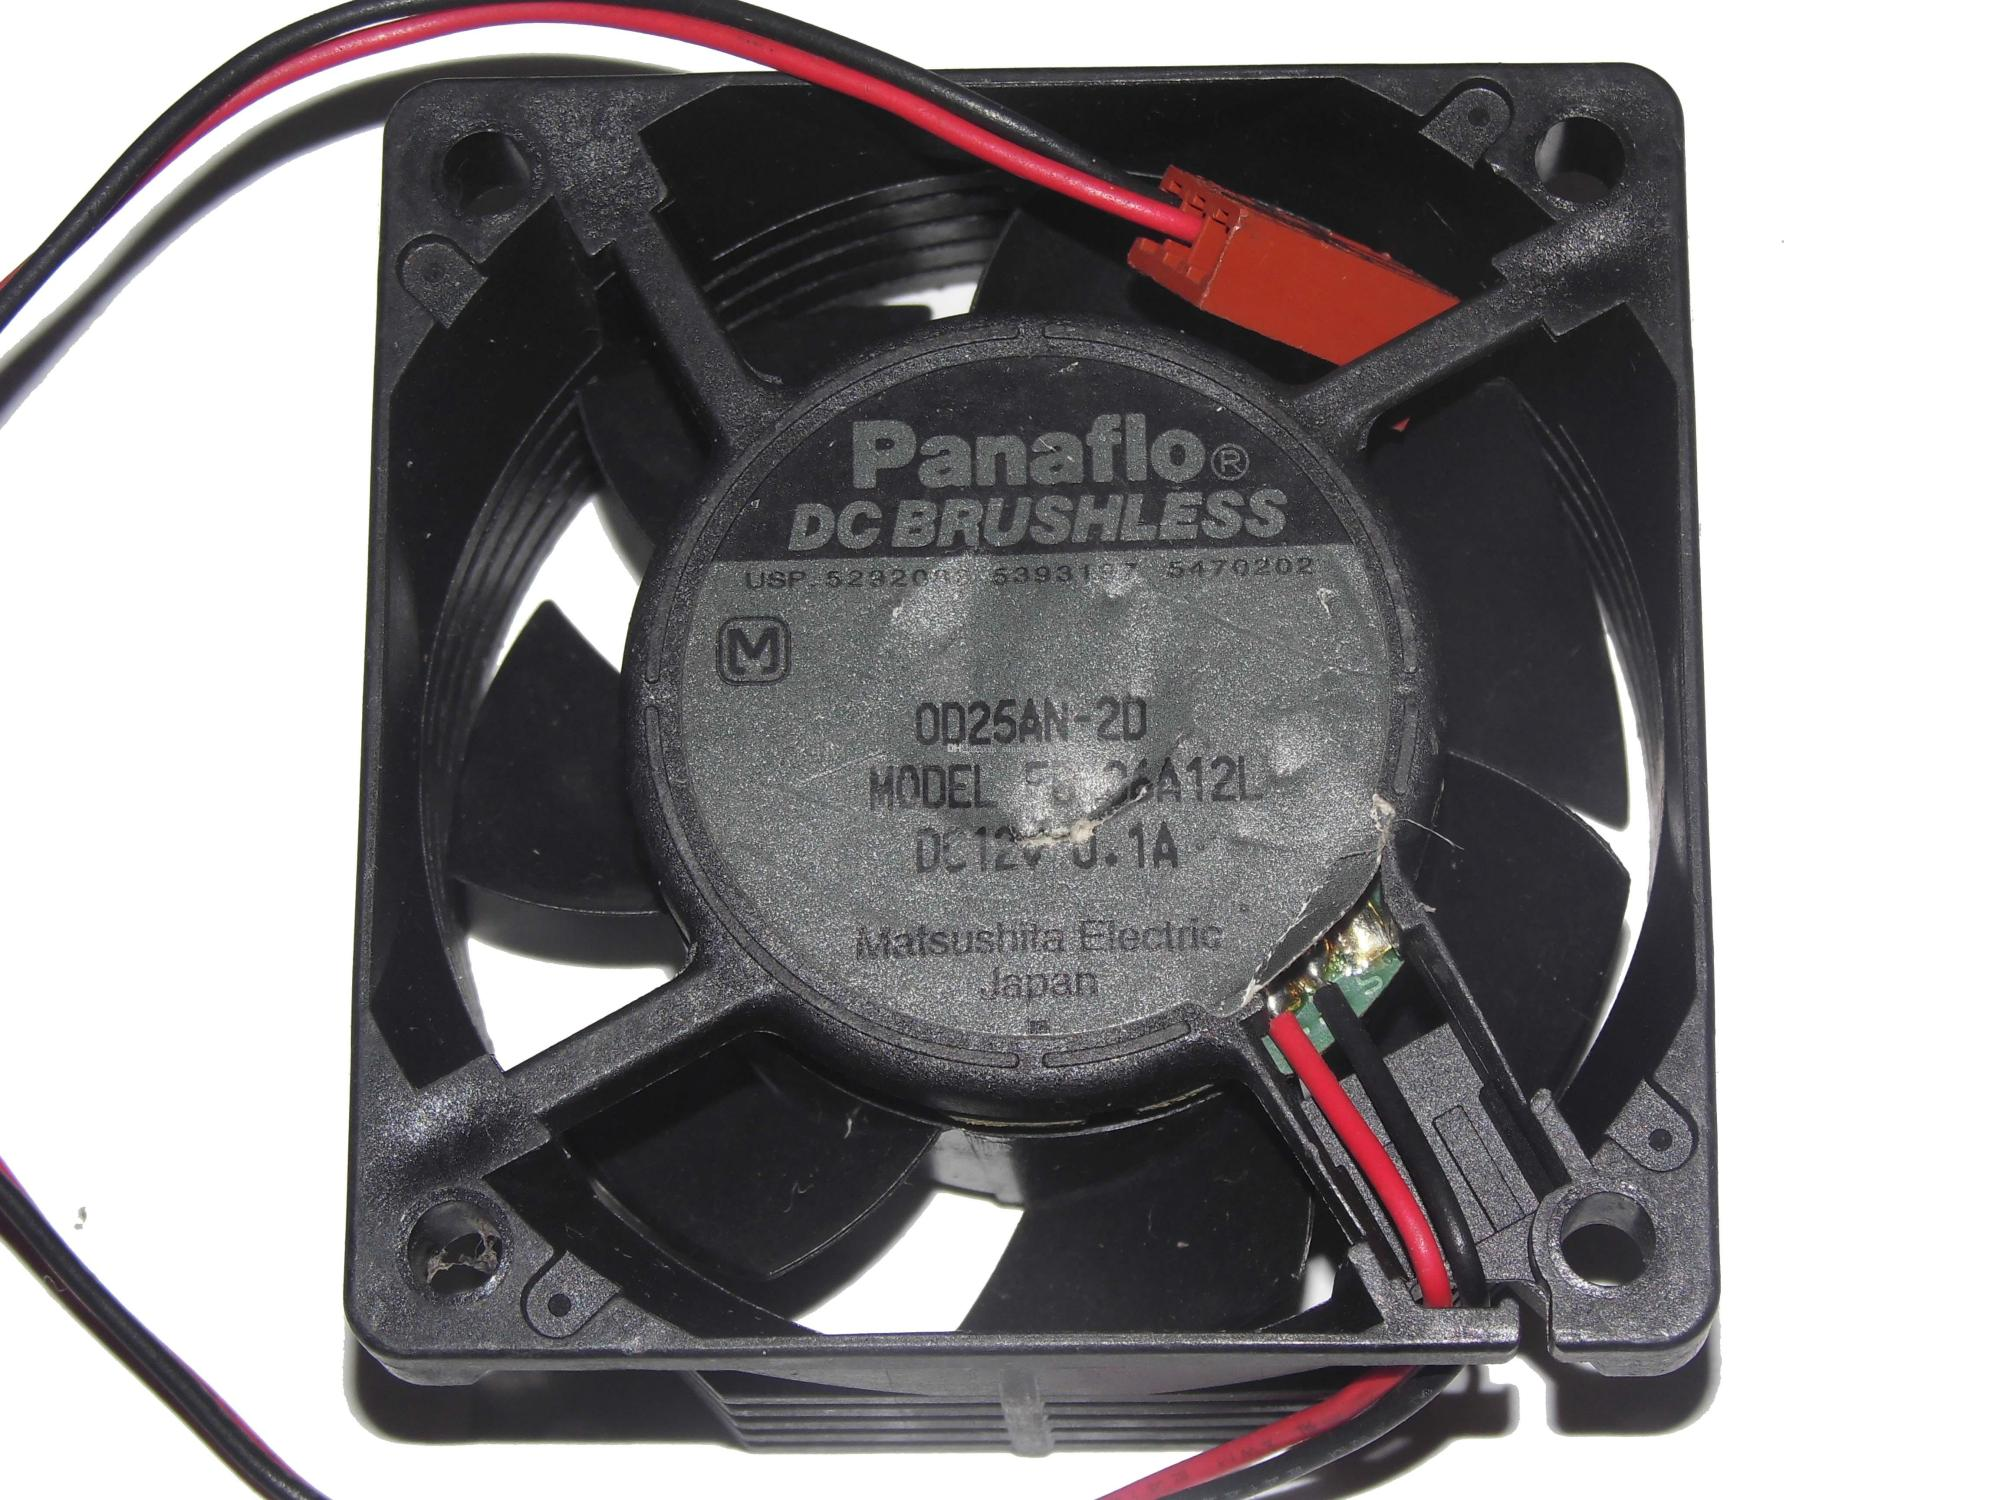 hight resolution of panaflo 60 15mm 6cm fbl06t12l 12v 0 1a 2 wires 2 pins case fan cpu cooler fbl06t12l 6cm 12v 2 wires case fan cooling fan online with 41 54 piece on